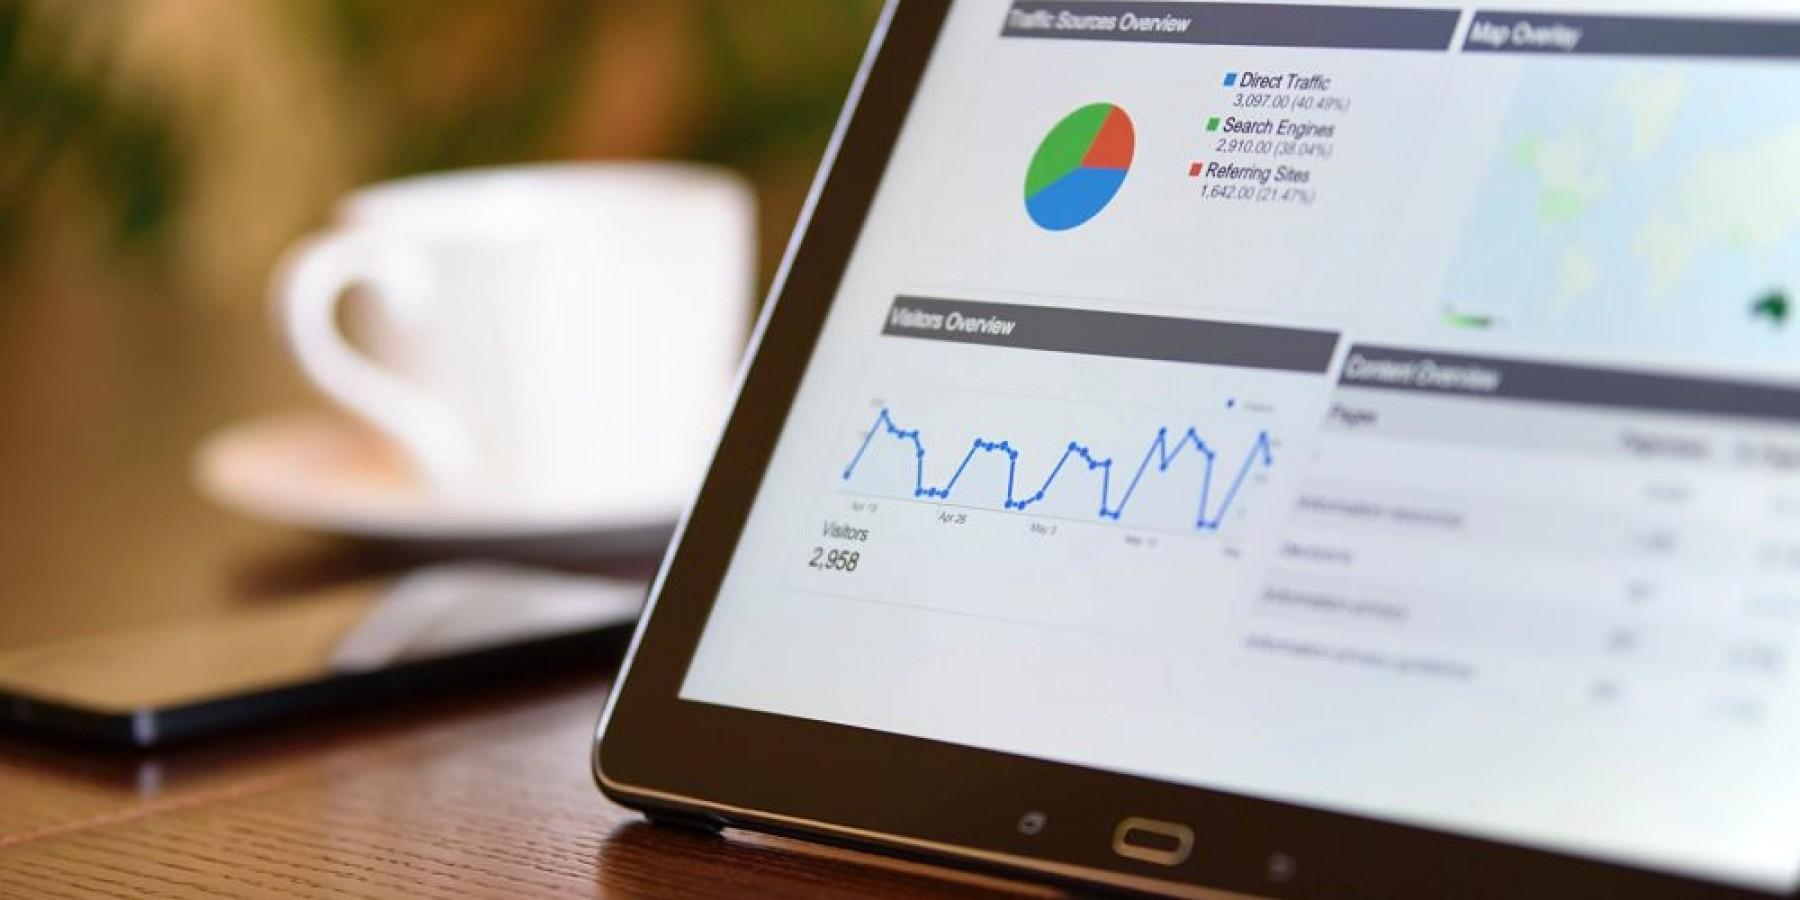 ¿Qué trae el global tag de Google Analytics, gtag.js?